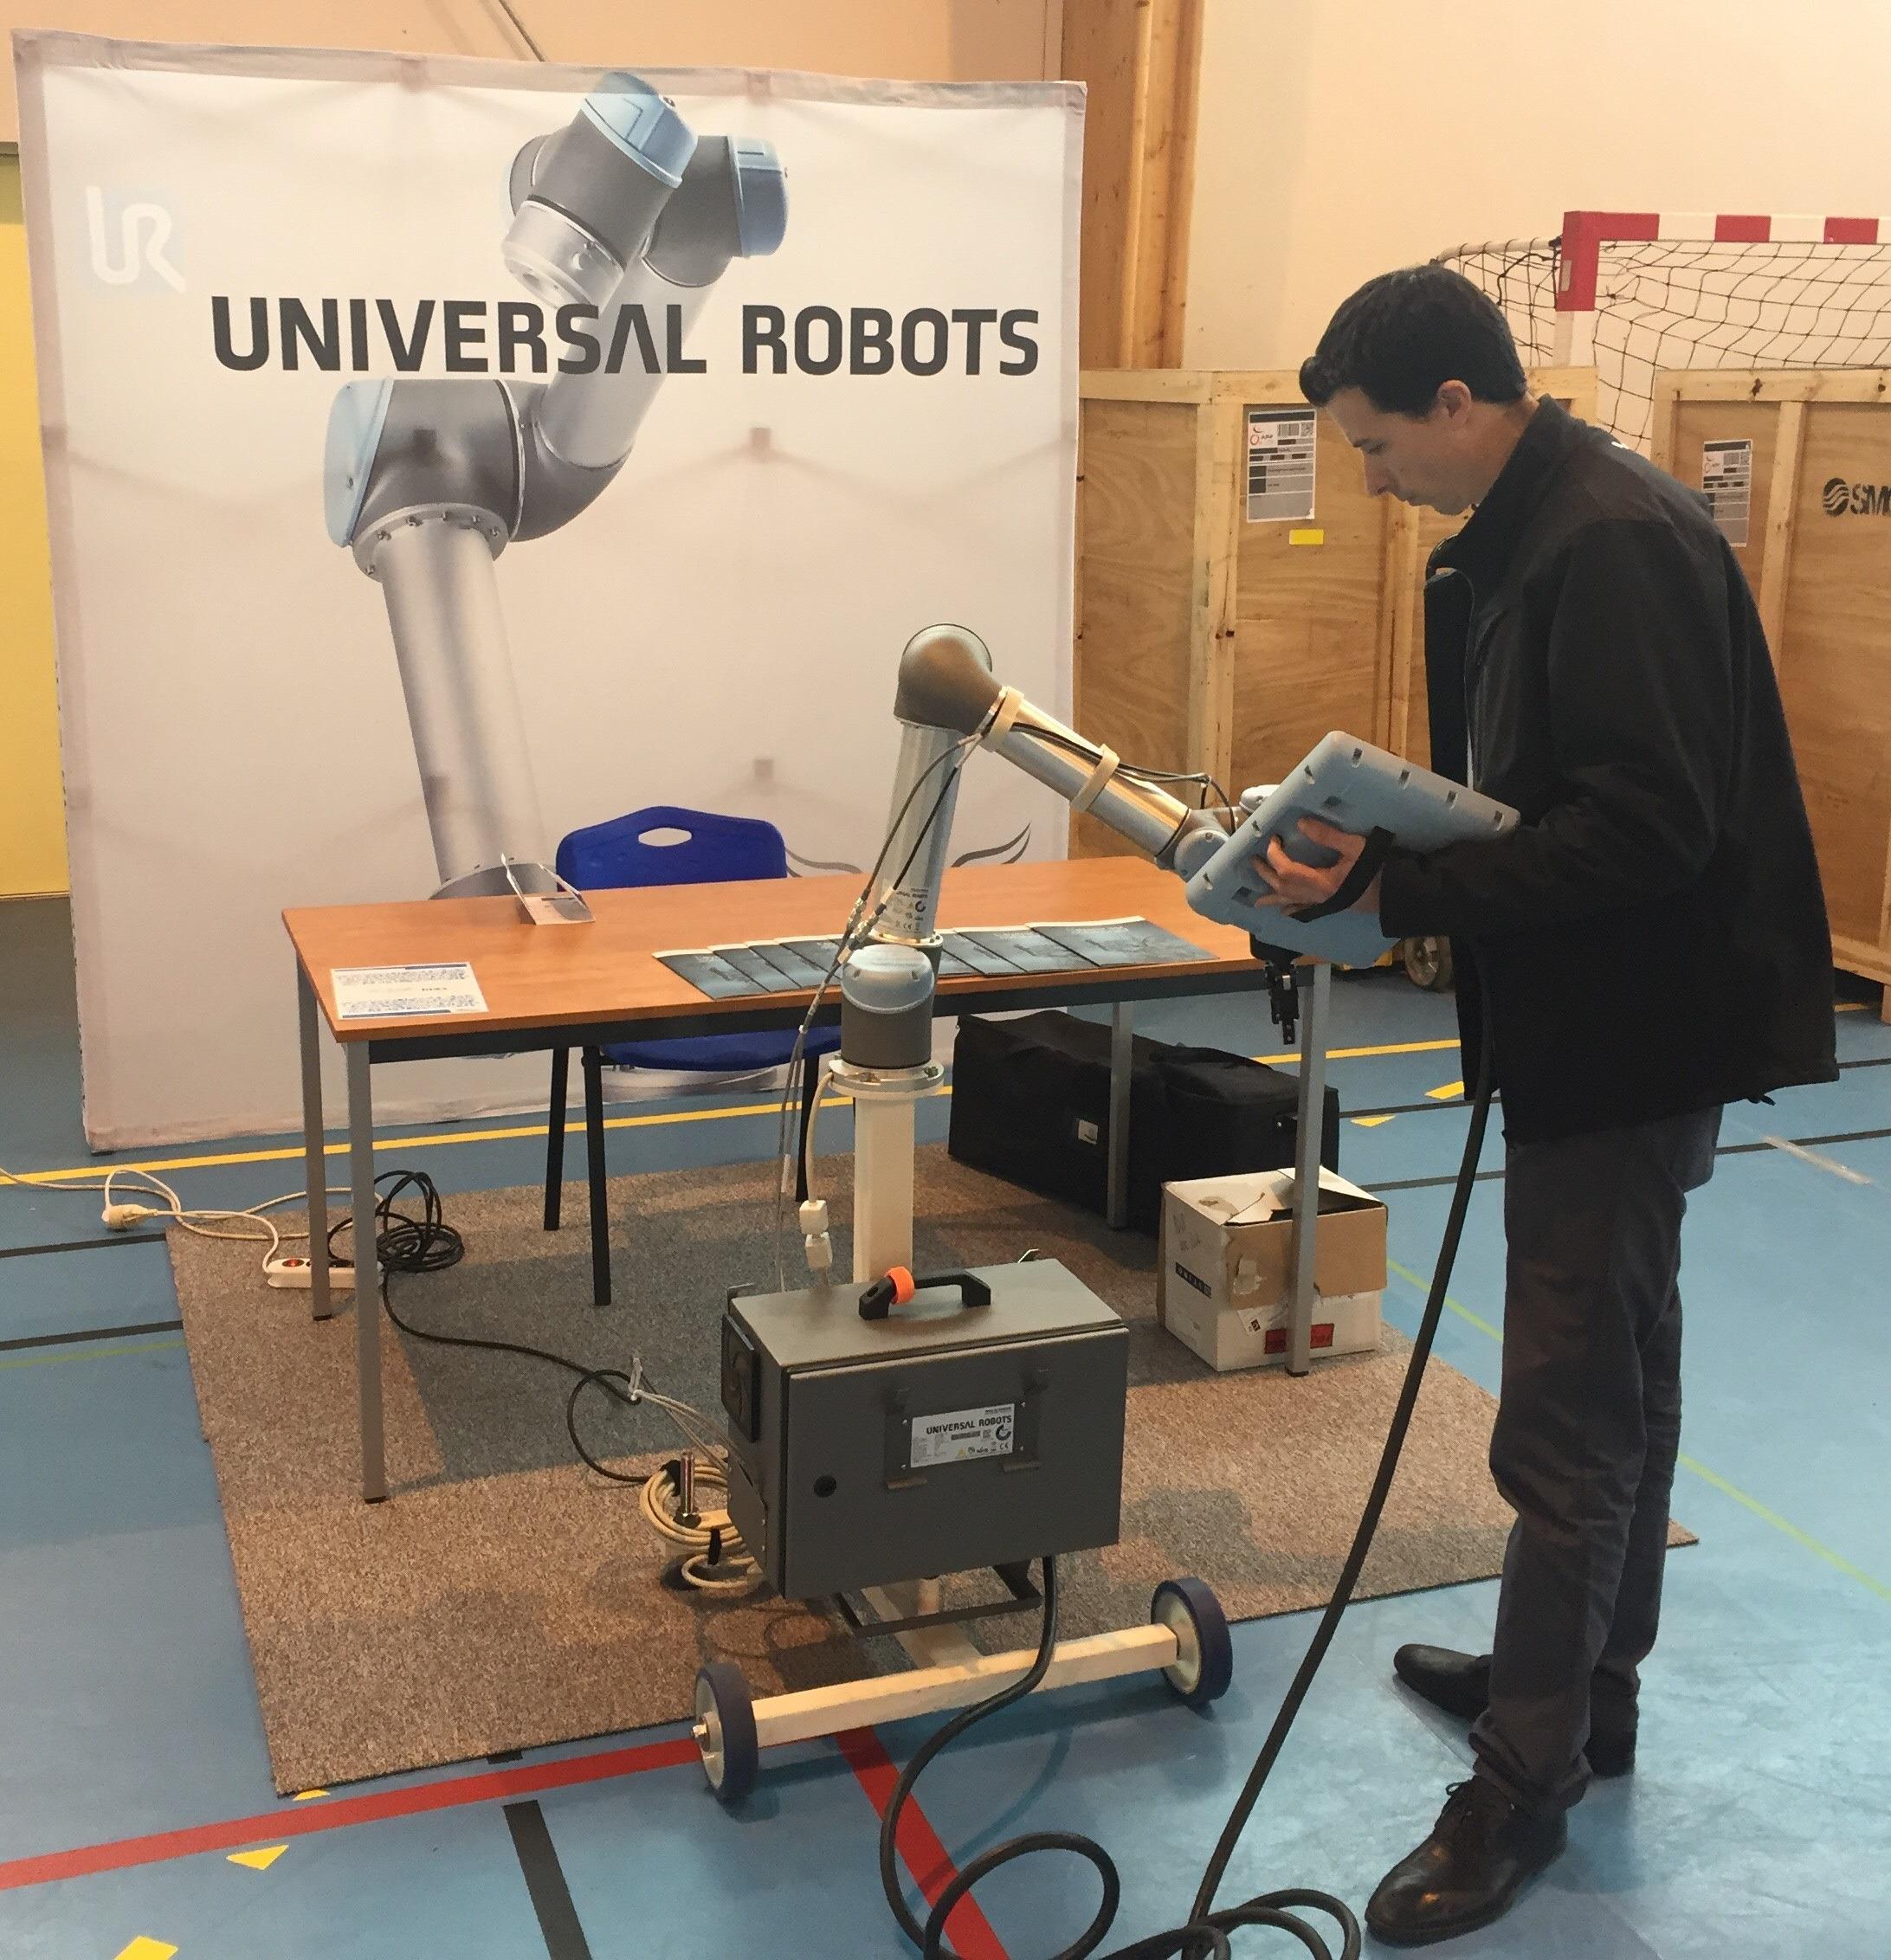 HMI MBS CFAI LORRAINE YUTZ UNIVERSAL ROBOTS